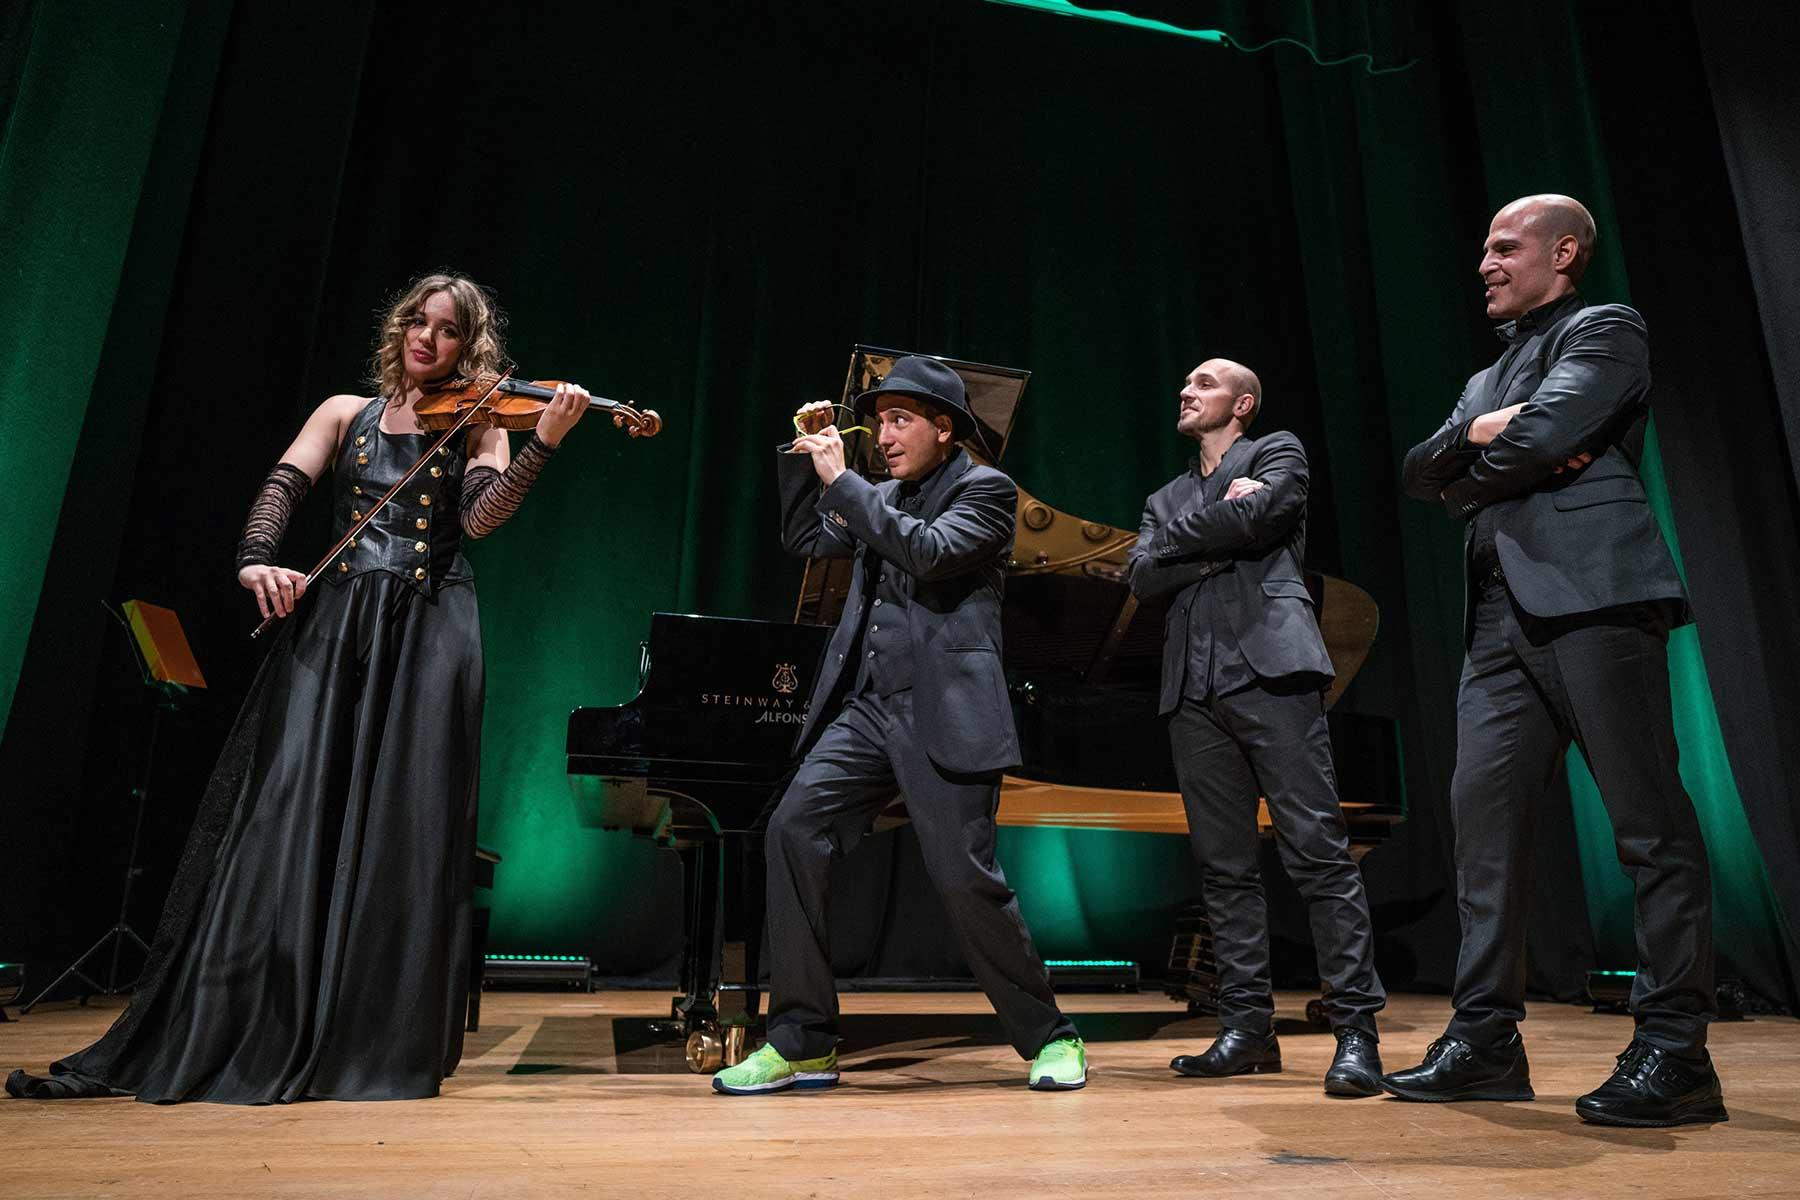 Anna-Tifu-Tango-Quartet-Stresa-Festival-2021 concerti settembre